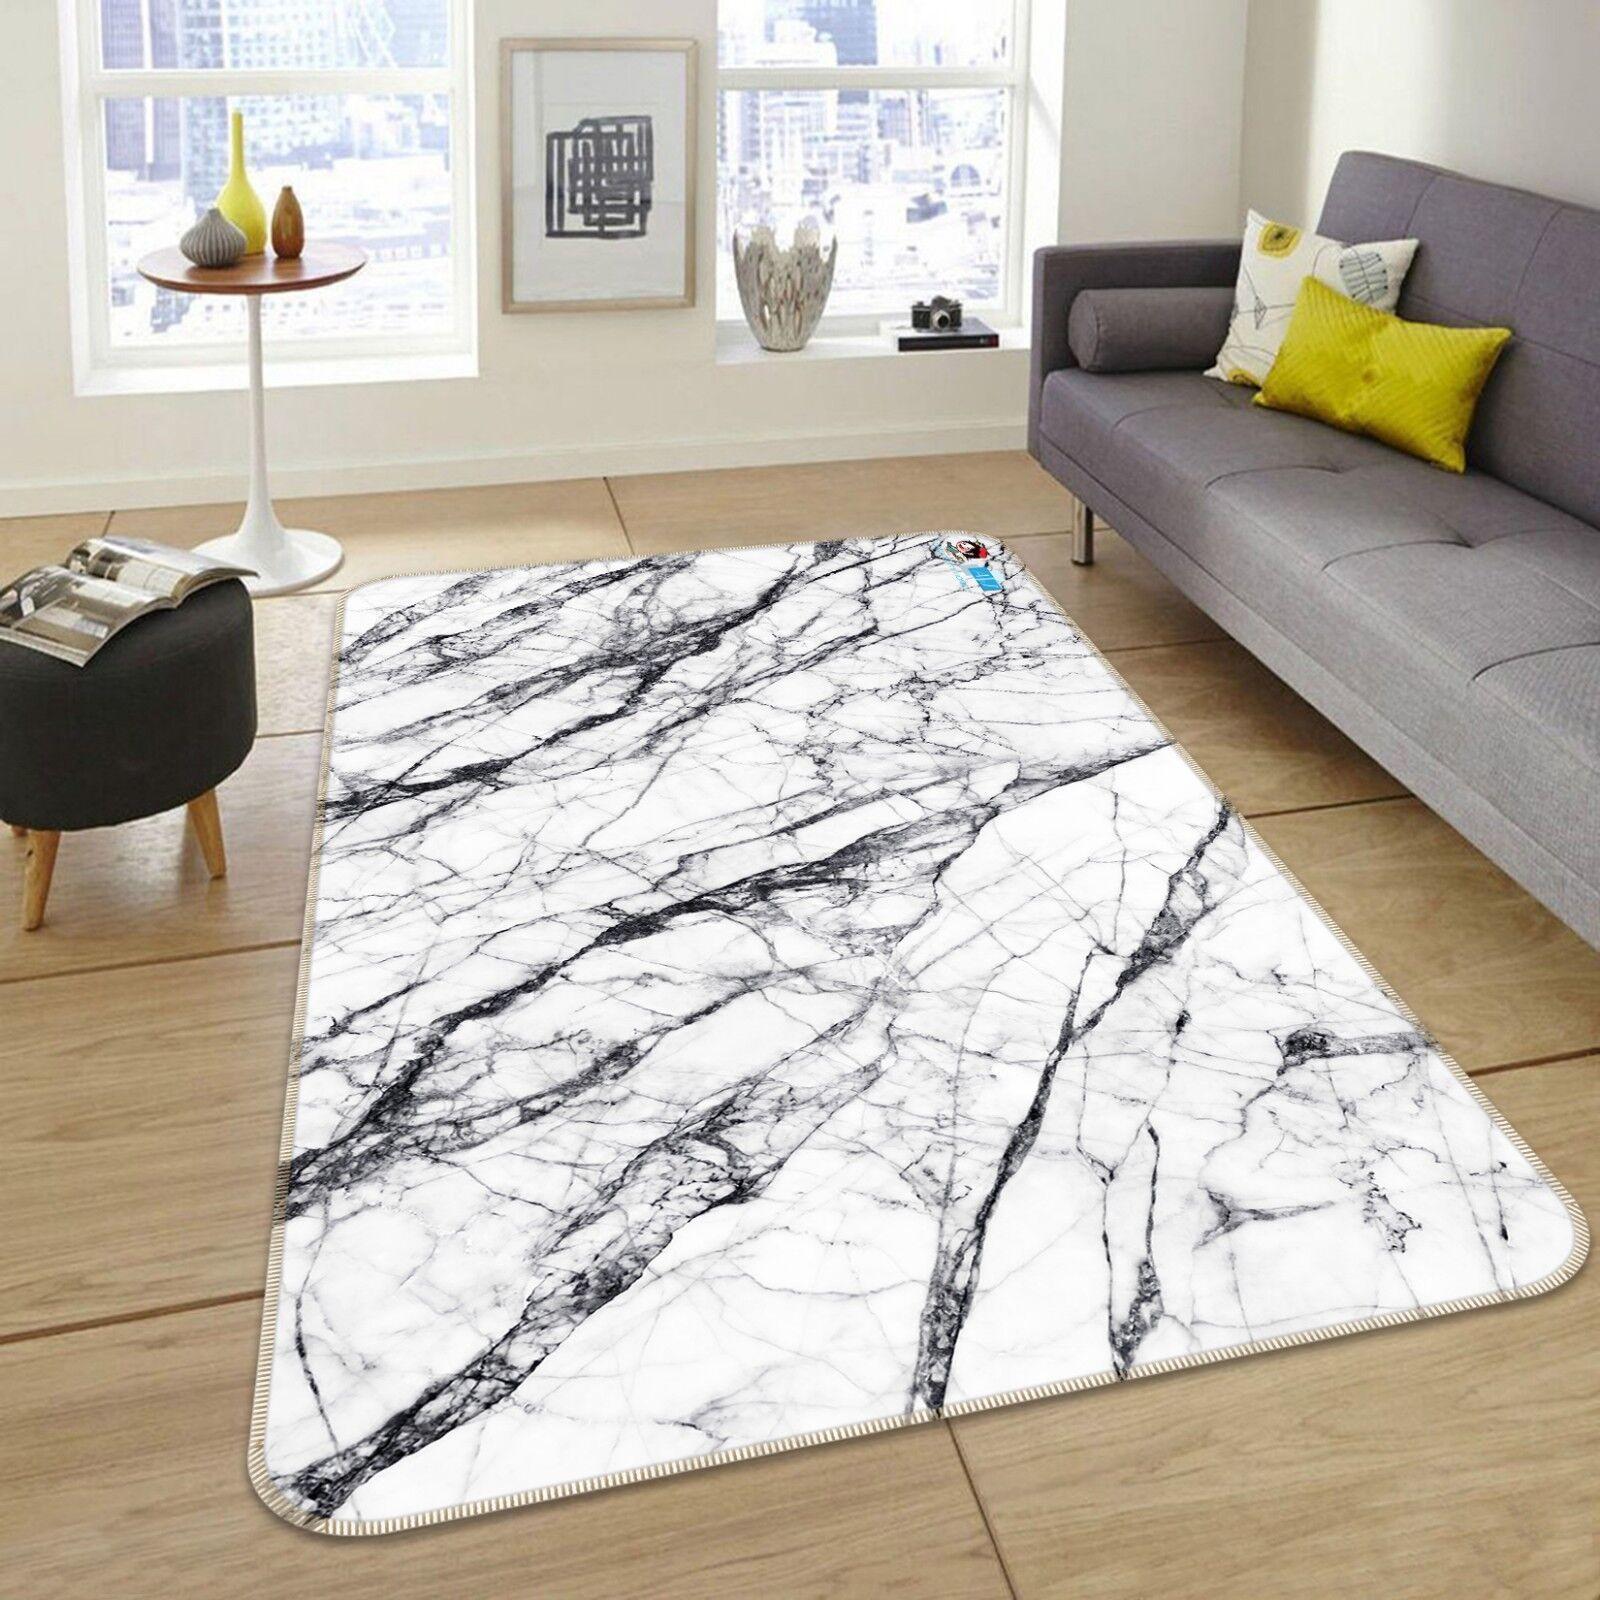 3D Pietra Texture 89 tappetino antiscivolo tappeto camera Tappetino Qualità Elegante foto Tappeto UK